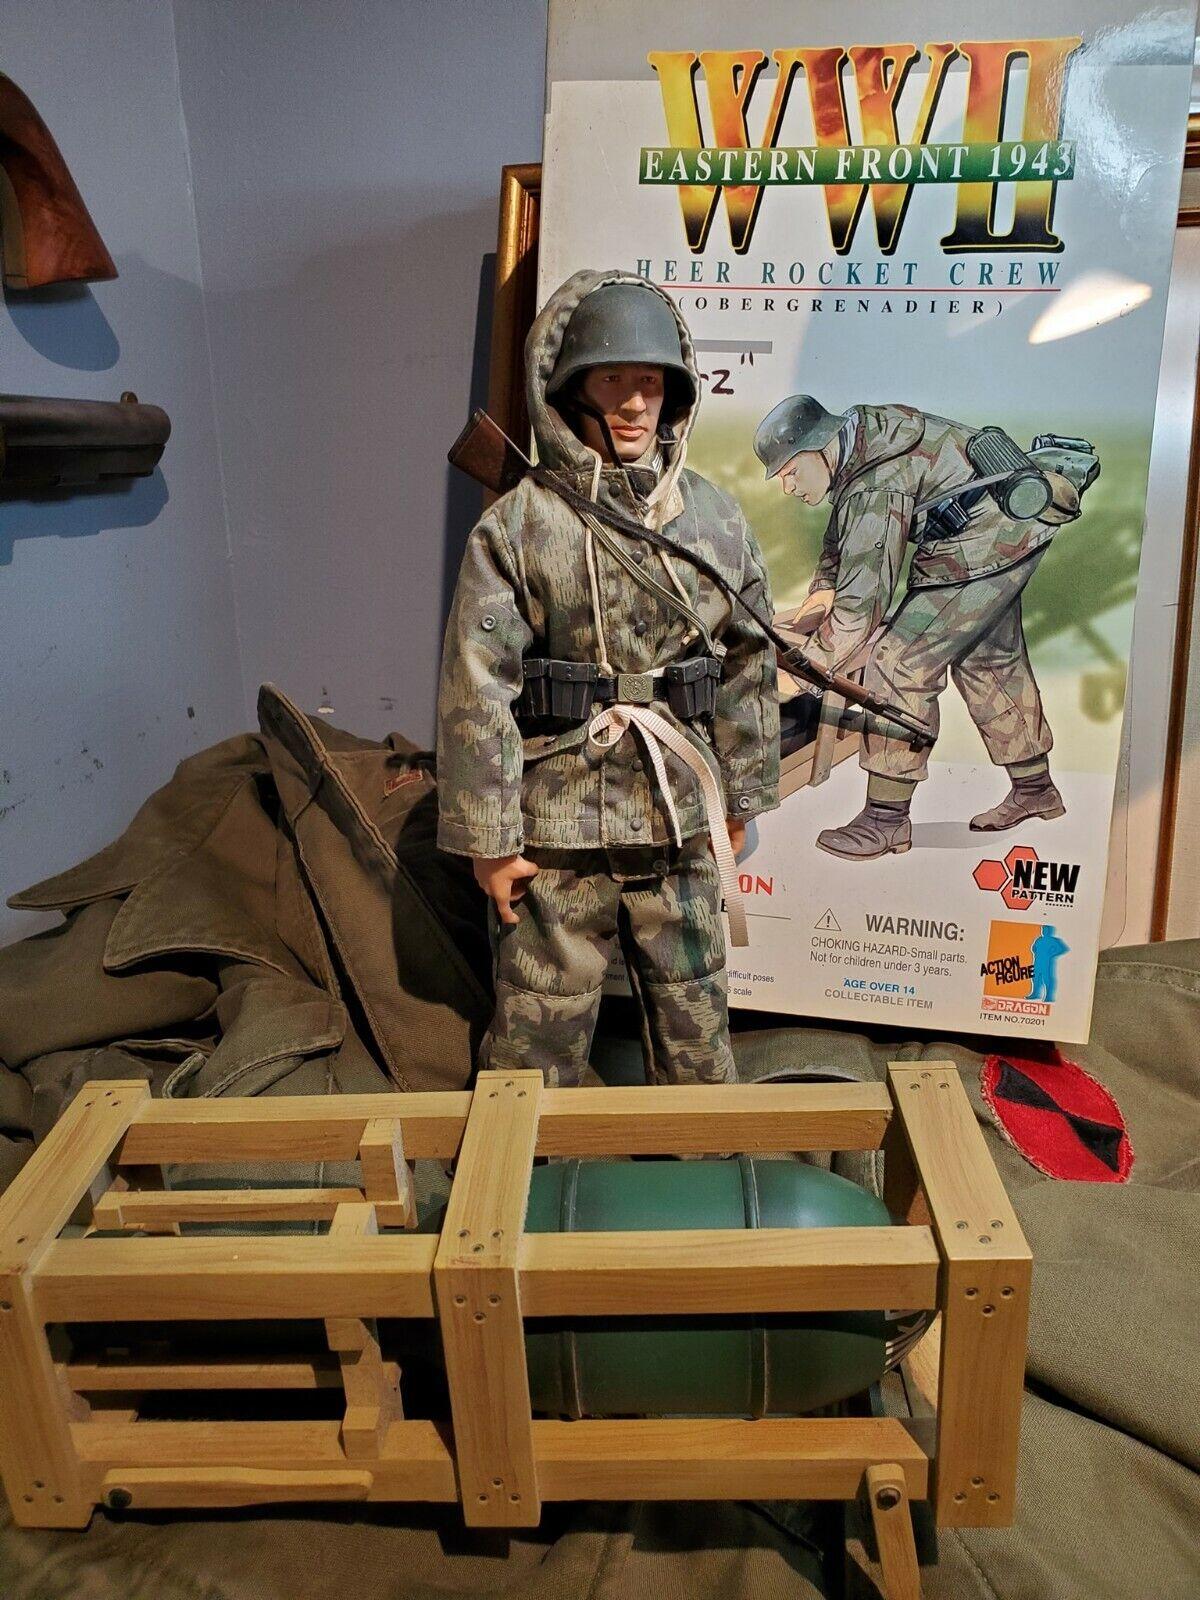 Dragon WW2 1/6th Scale New Generation Action Figure Kurz With Box. - $65.00